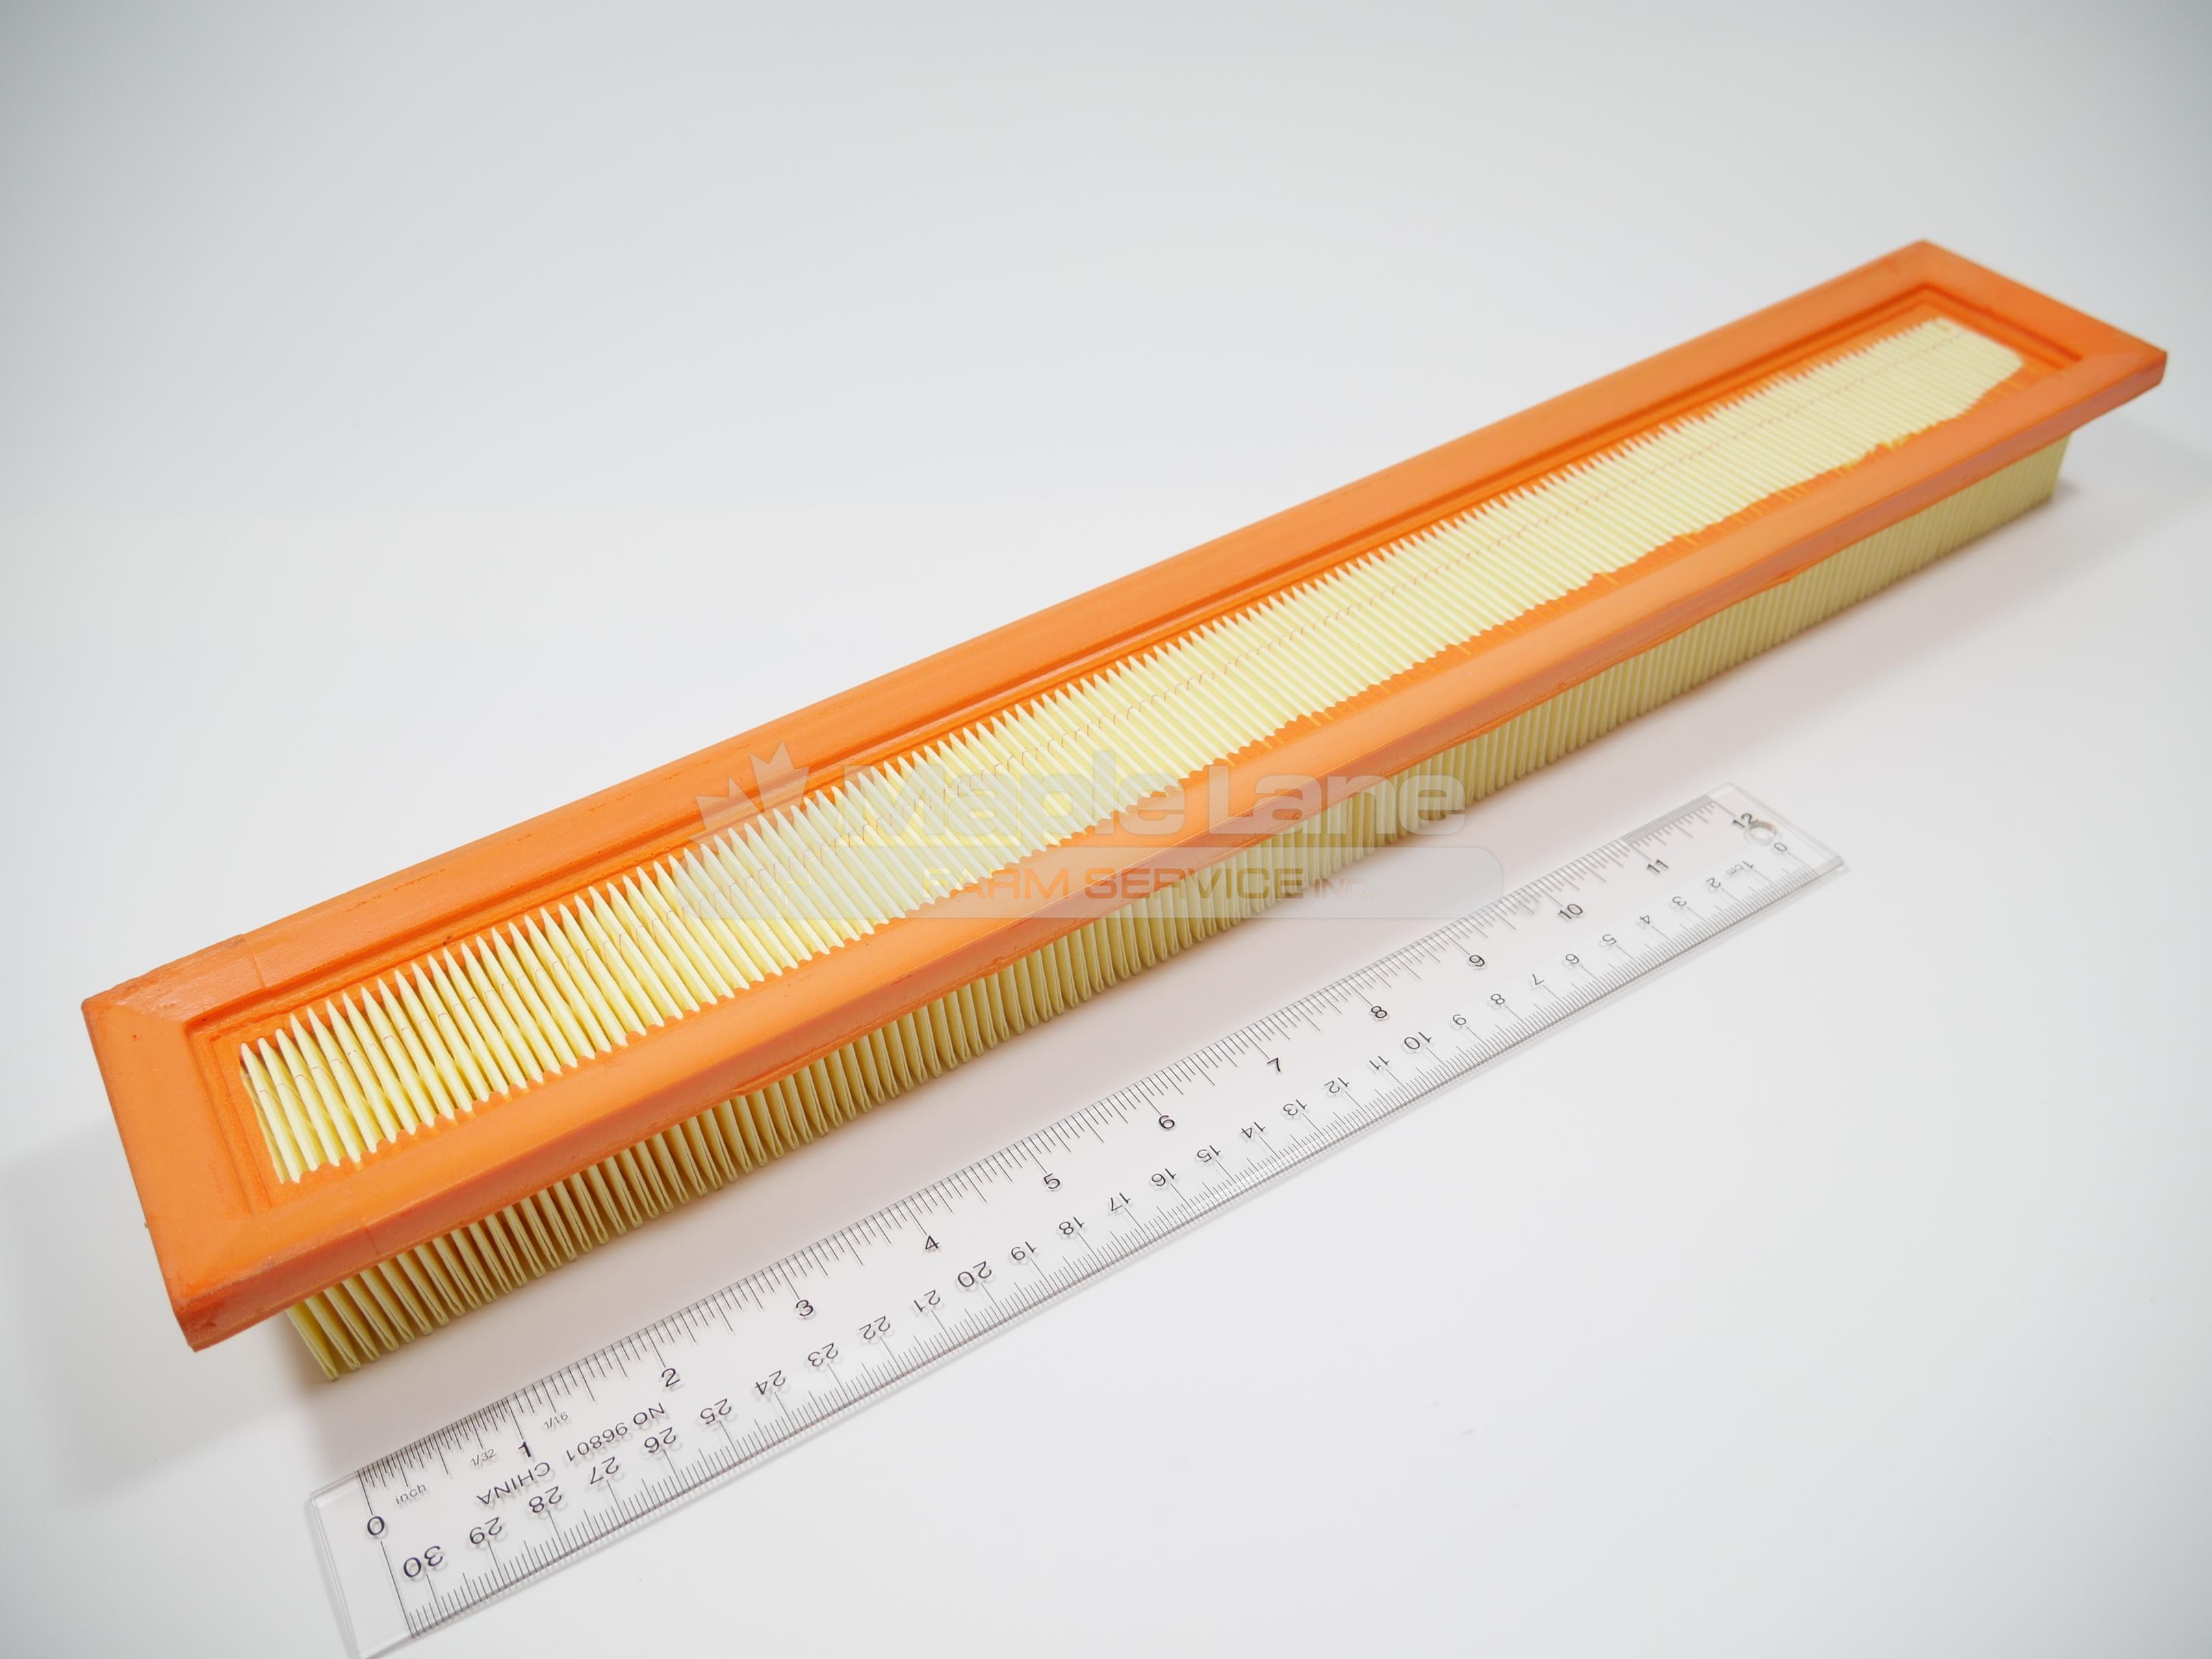 7065499m1 filter element